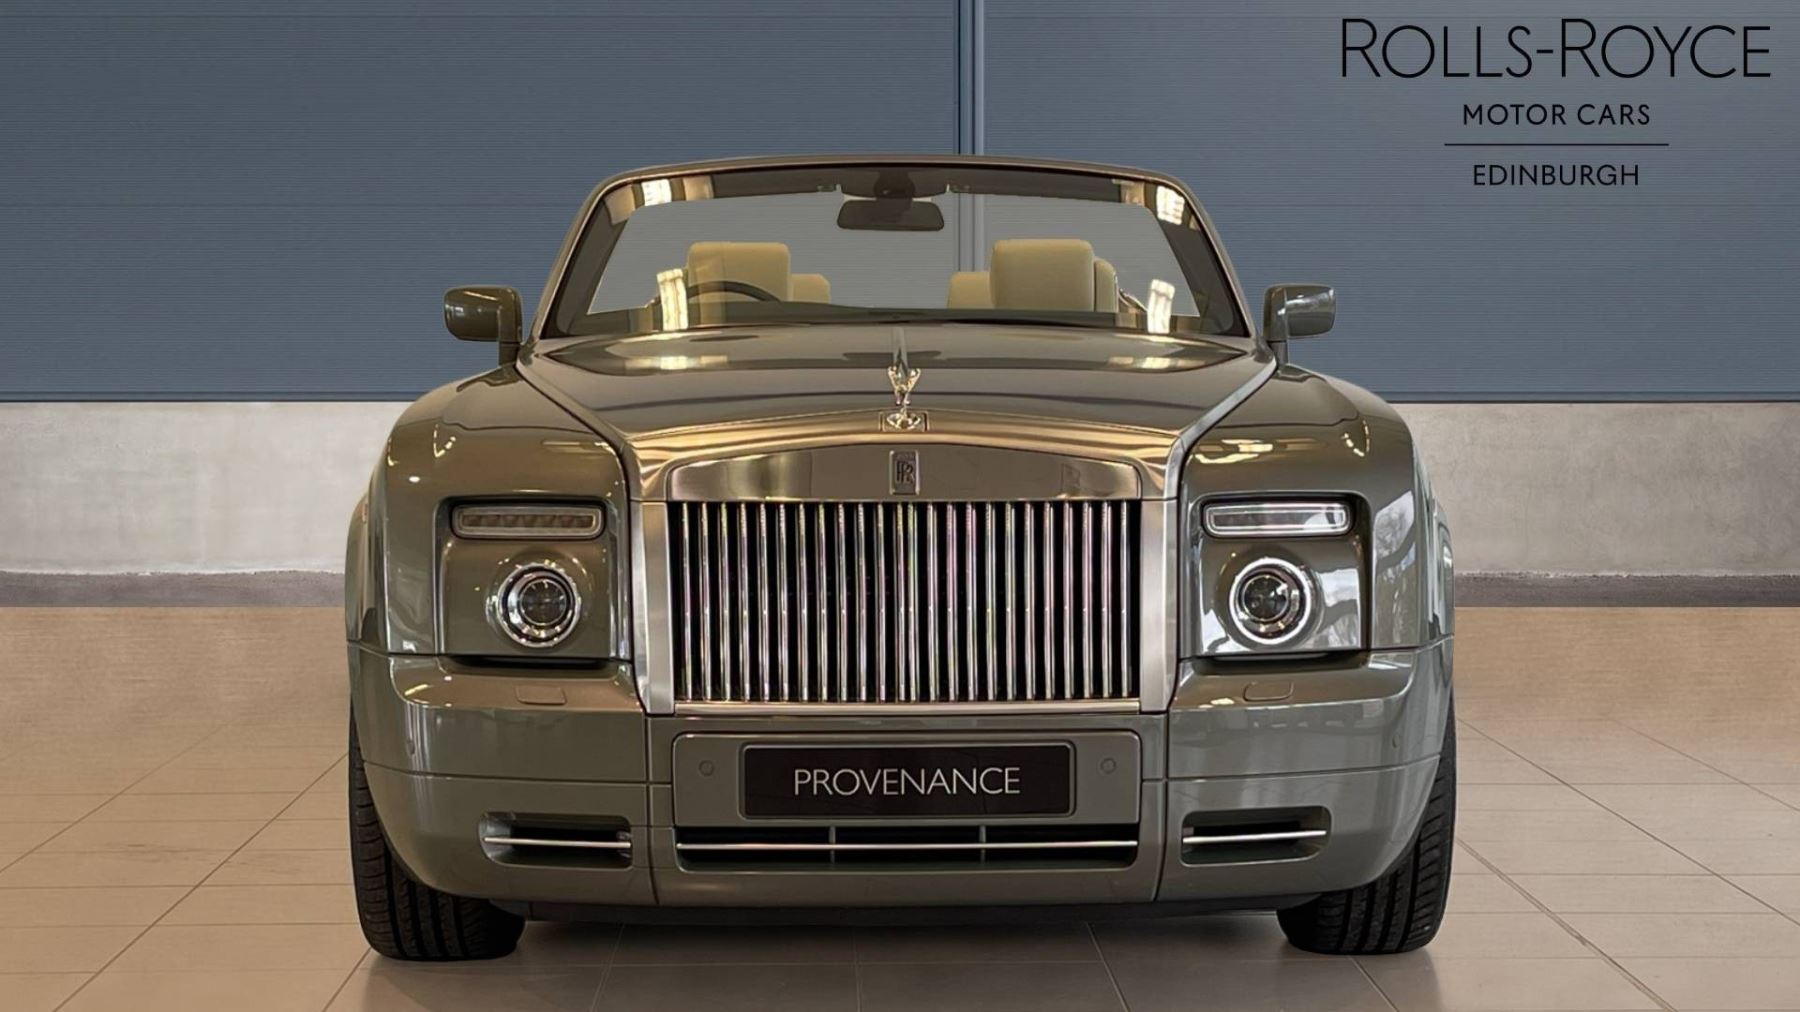 Rolls-Royce Phantom Drophead Coupe 2dr Auto image 4